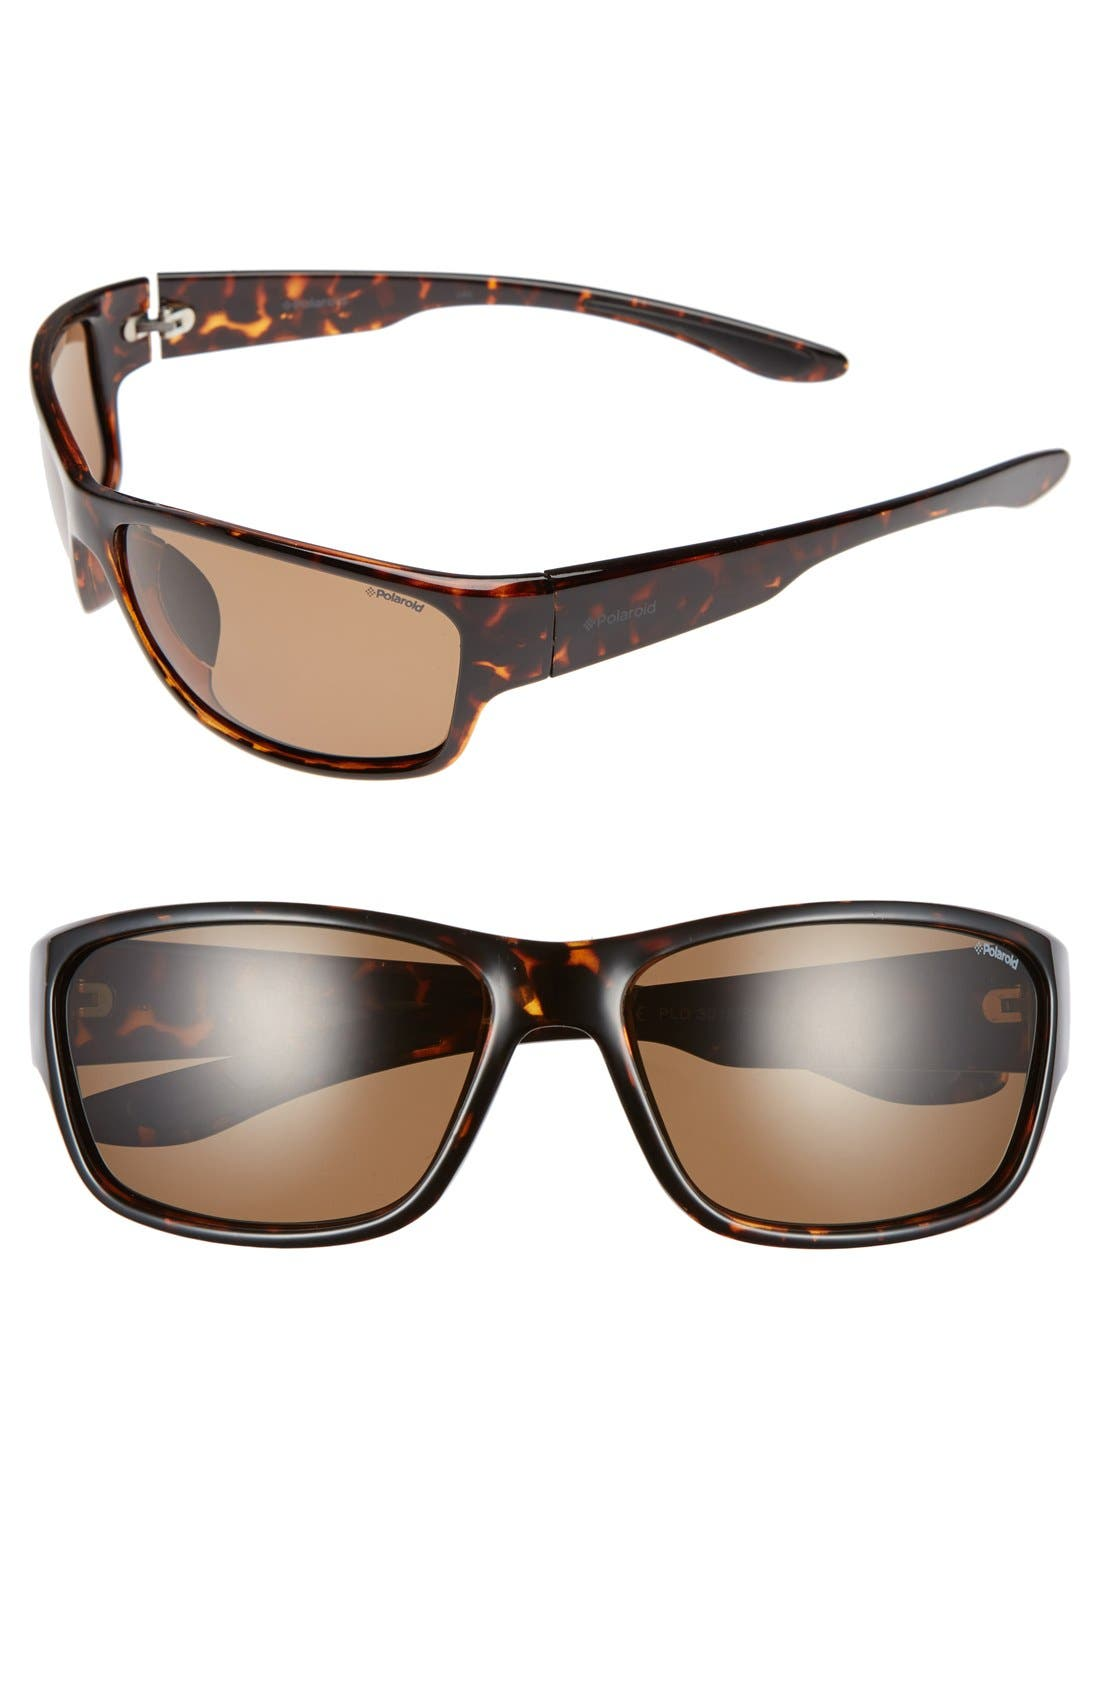 POLAROID EYEWEAR 3015/S 63mm Polarized Sunglasses